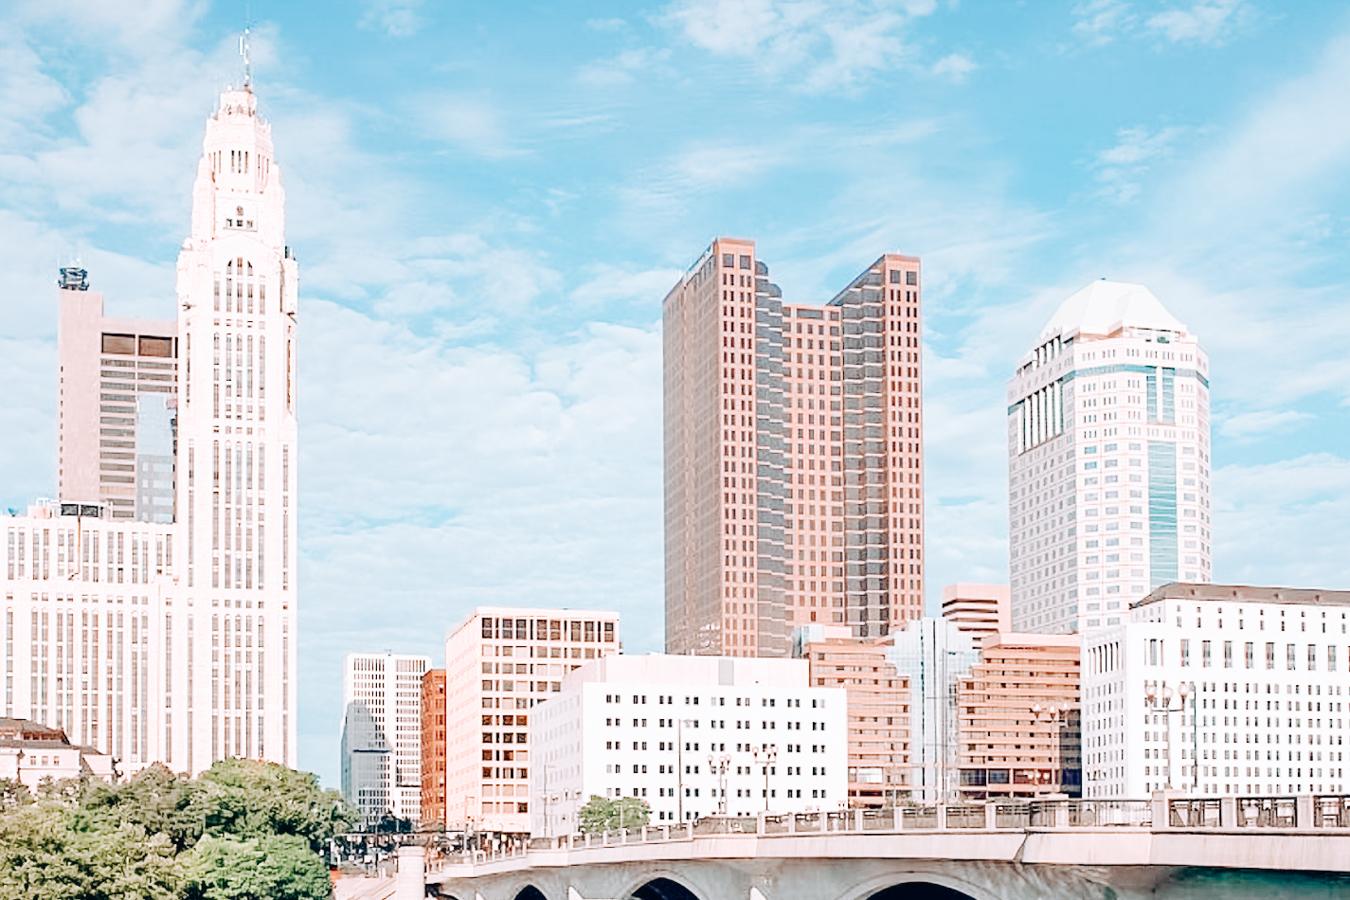 Buildings in Columbus